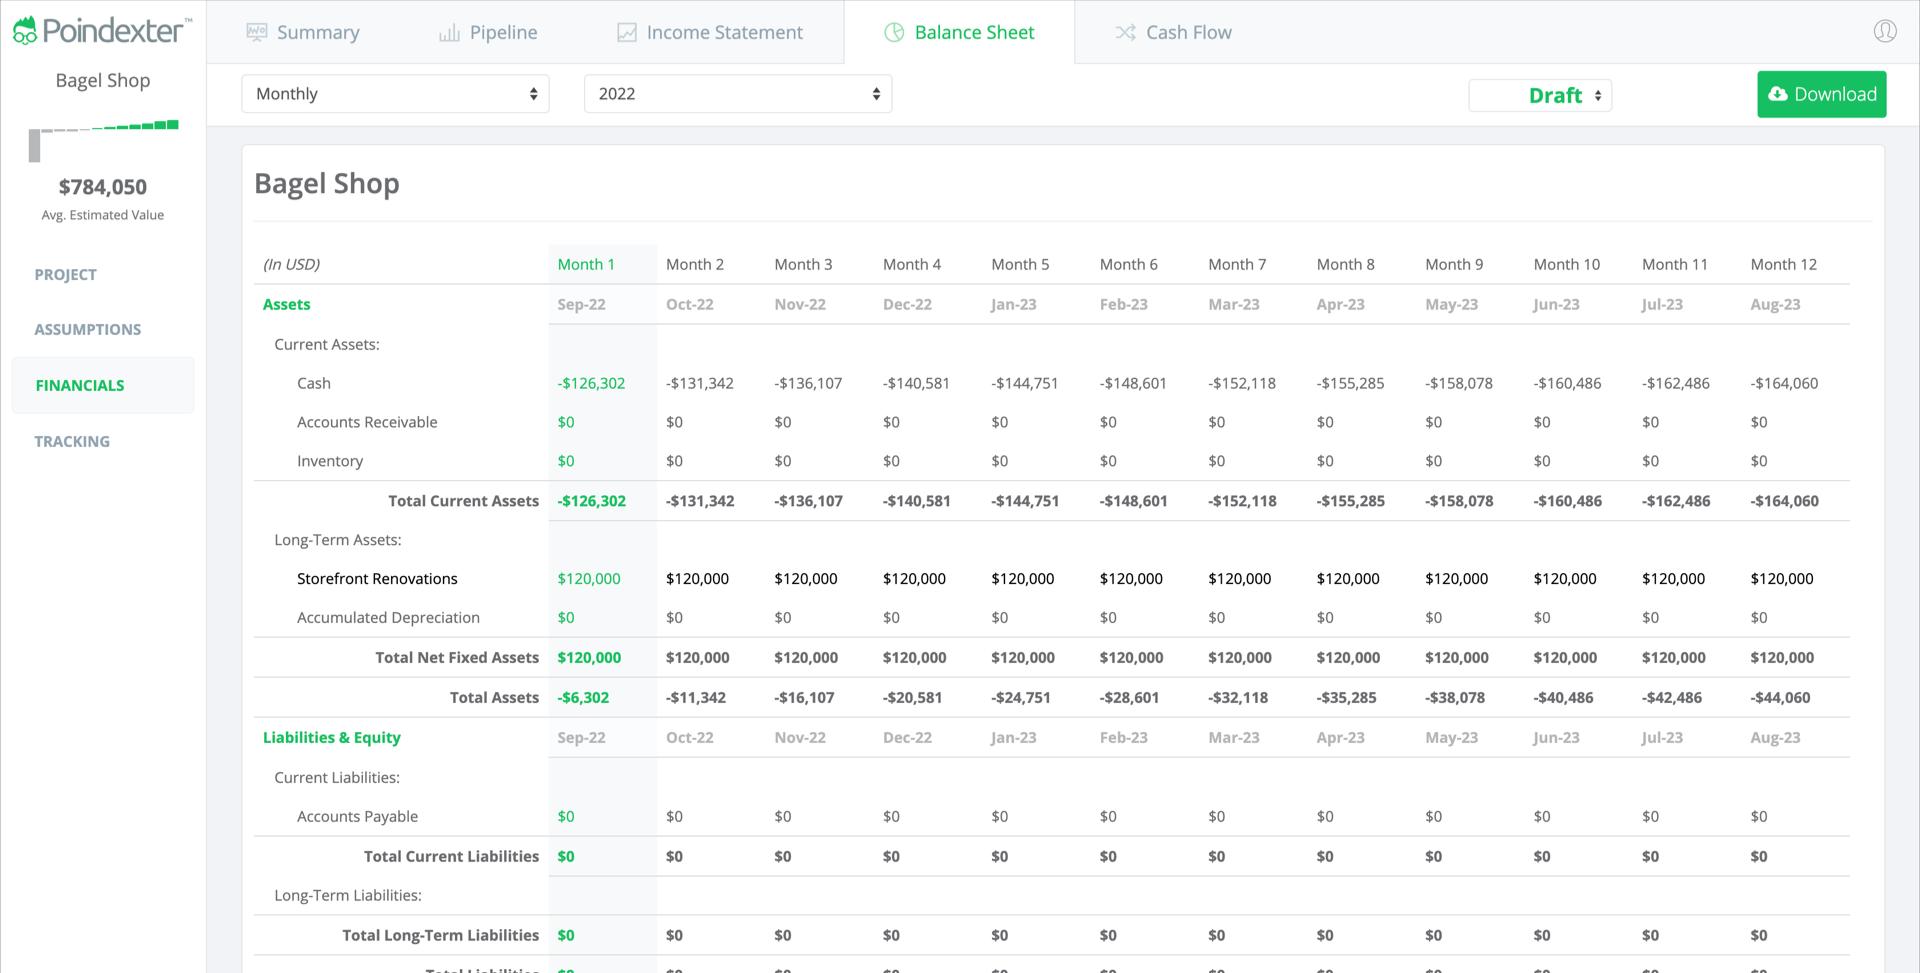 Bagel Shop Pro Forma Balance Sheet